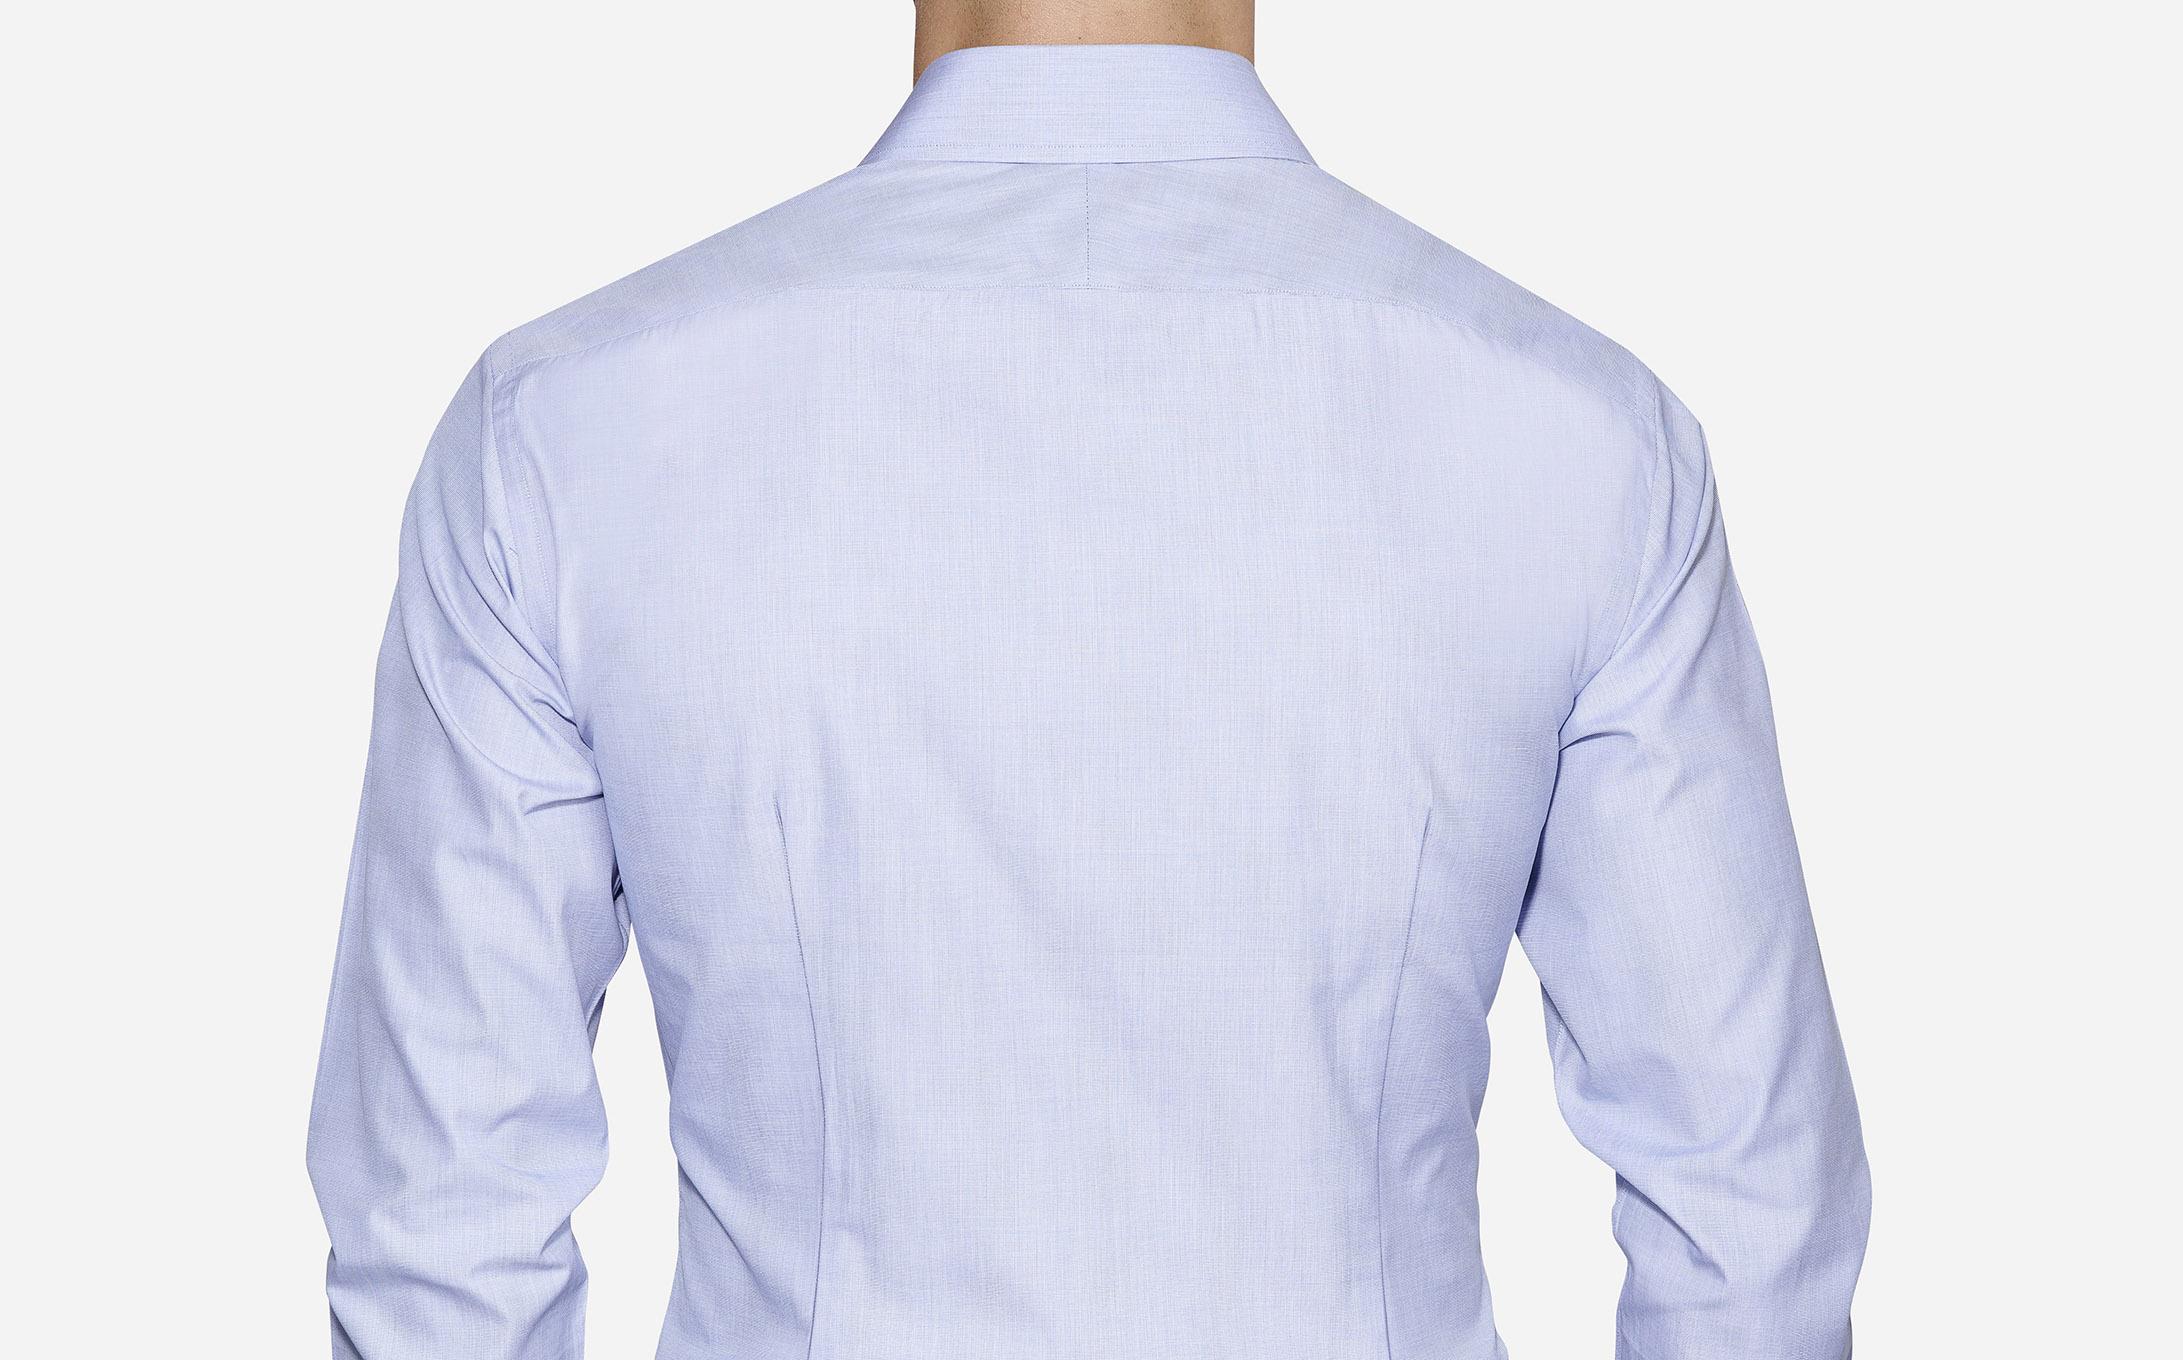 2 Darts in back shirt